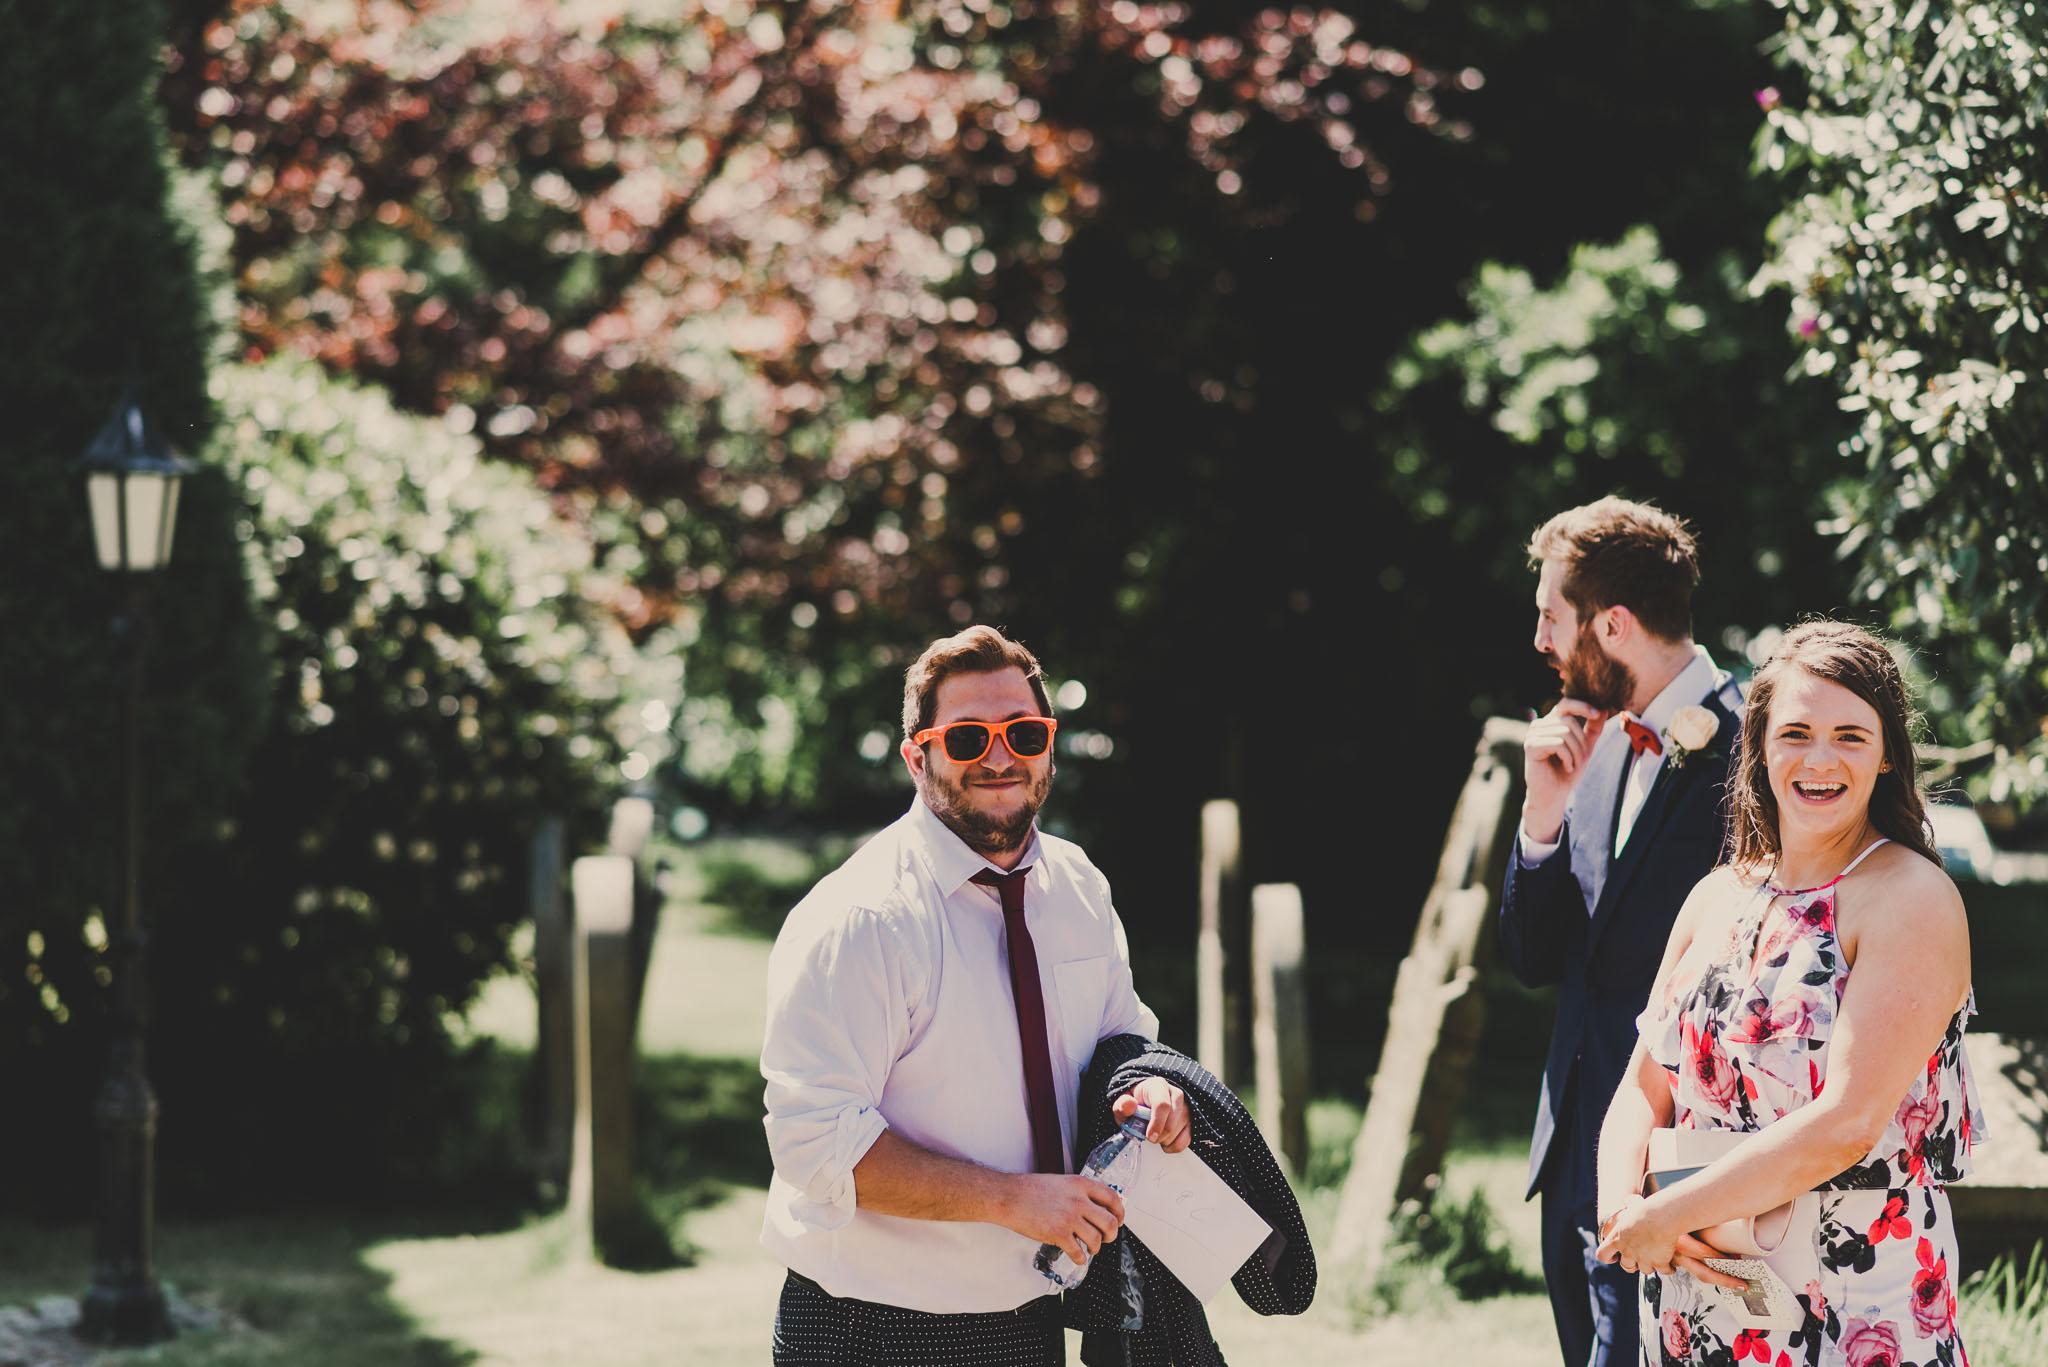 2 romantic and intimate wedding phtography (10).jpg